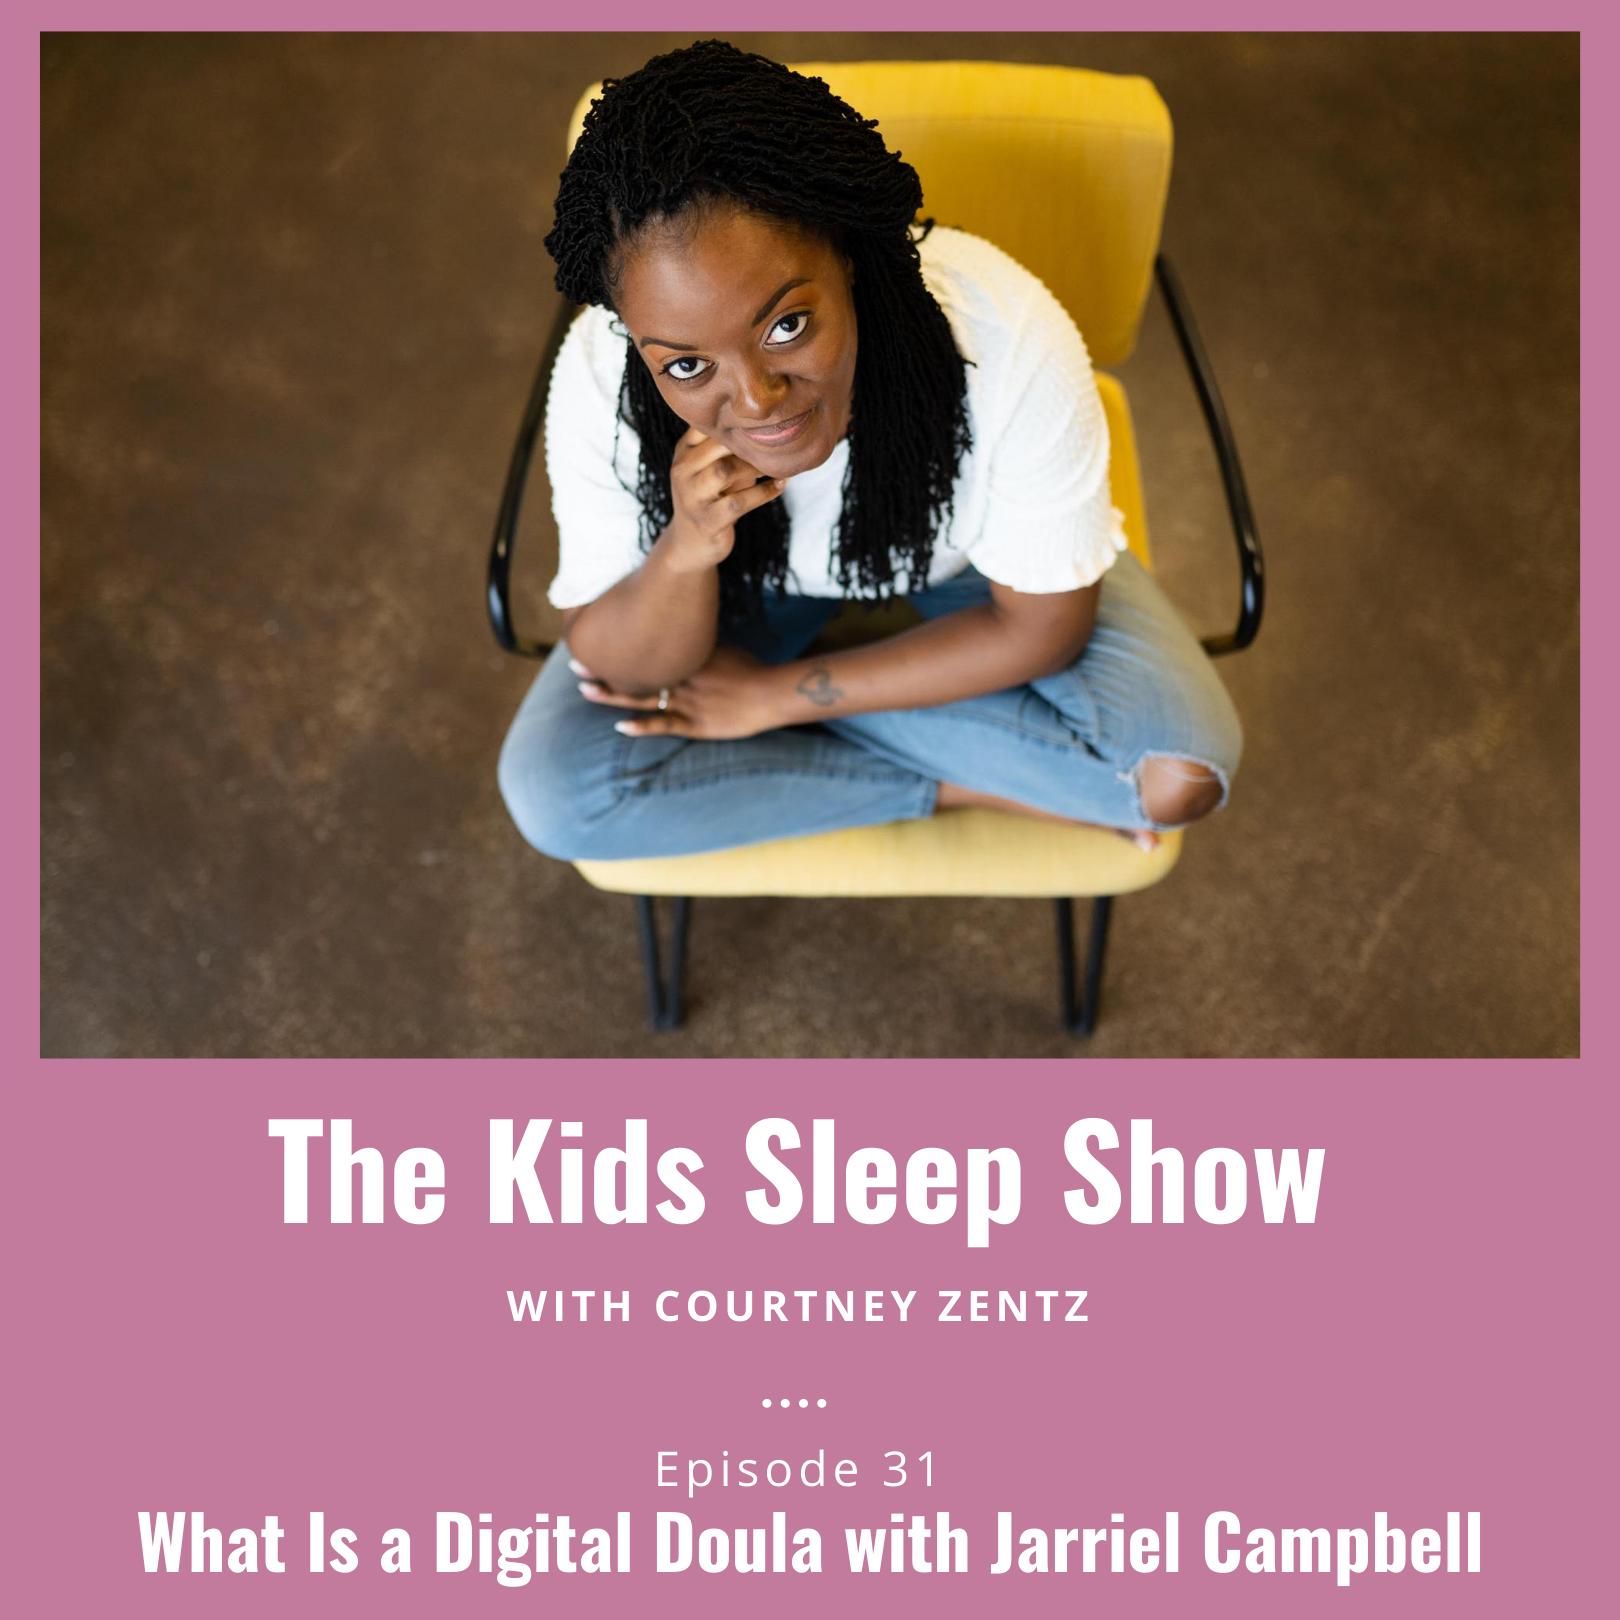 Digital Doula - Jarriel Campbell